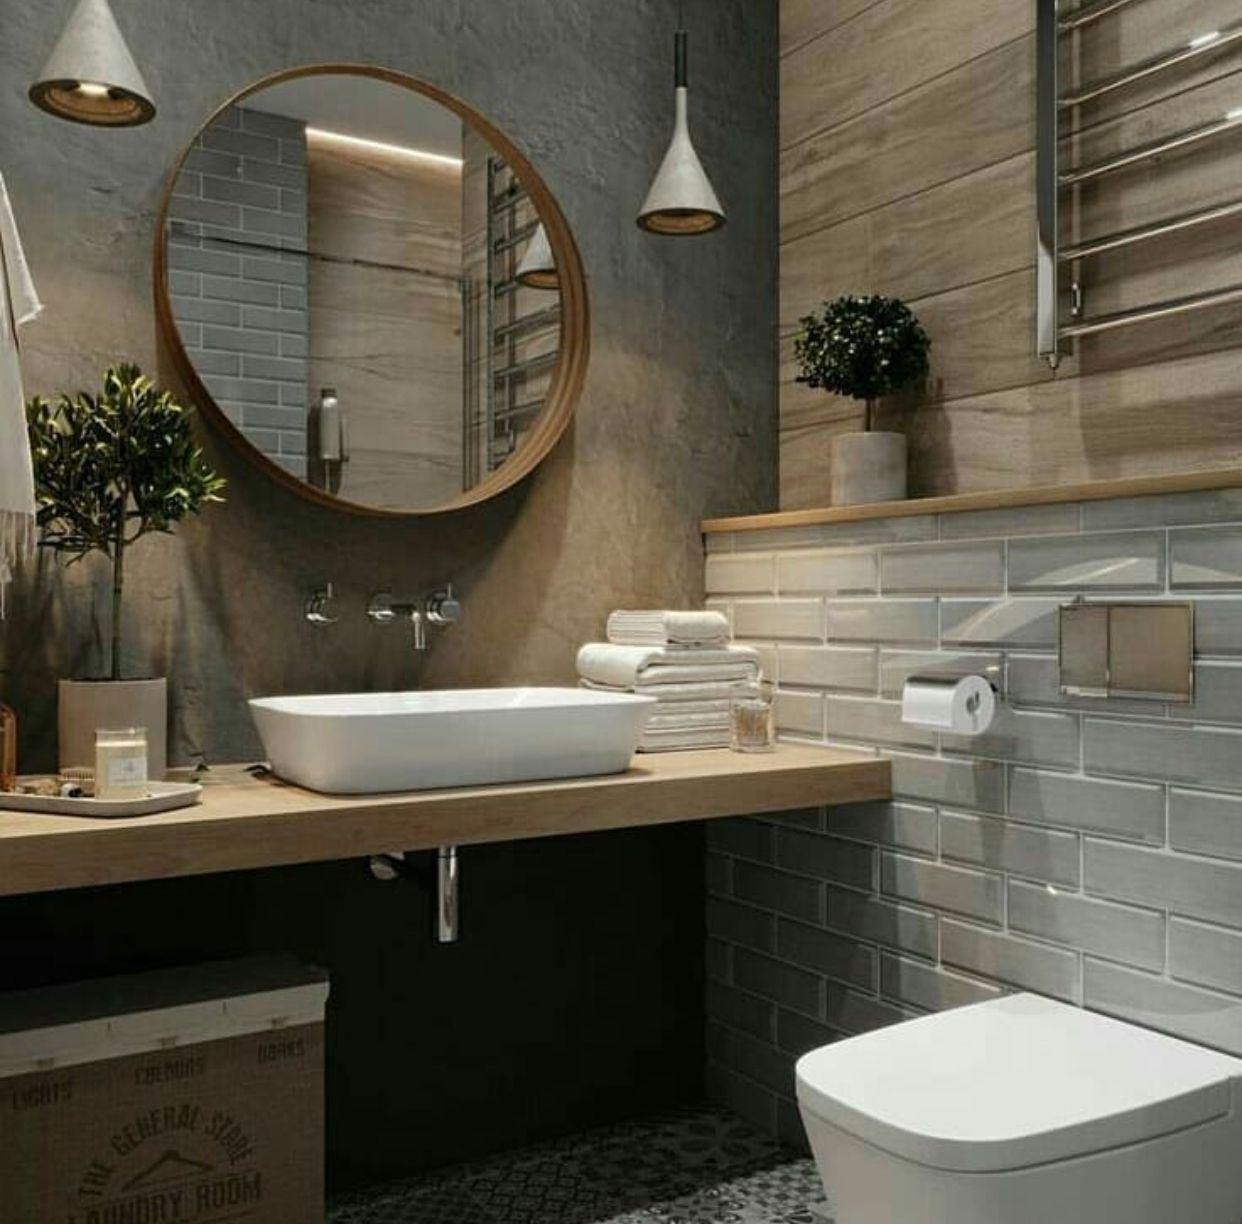 Epingle Par Shaima Dekik Sur Banheiro Idee Salle De Bain Salle De Bain Design Decoration Salle De Bain